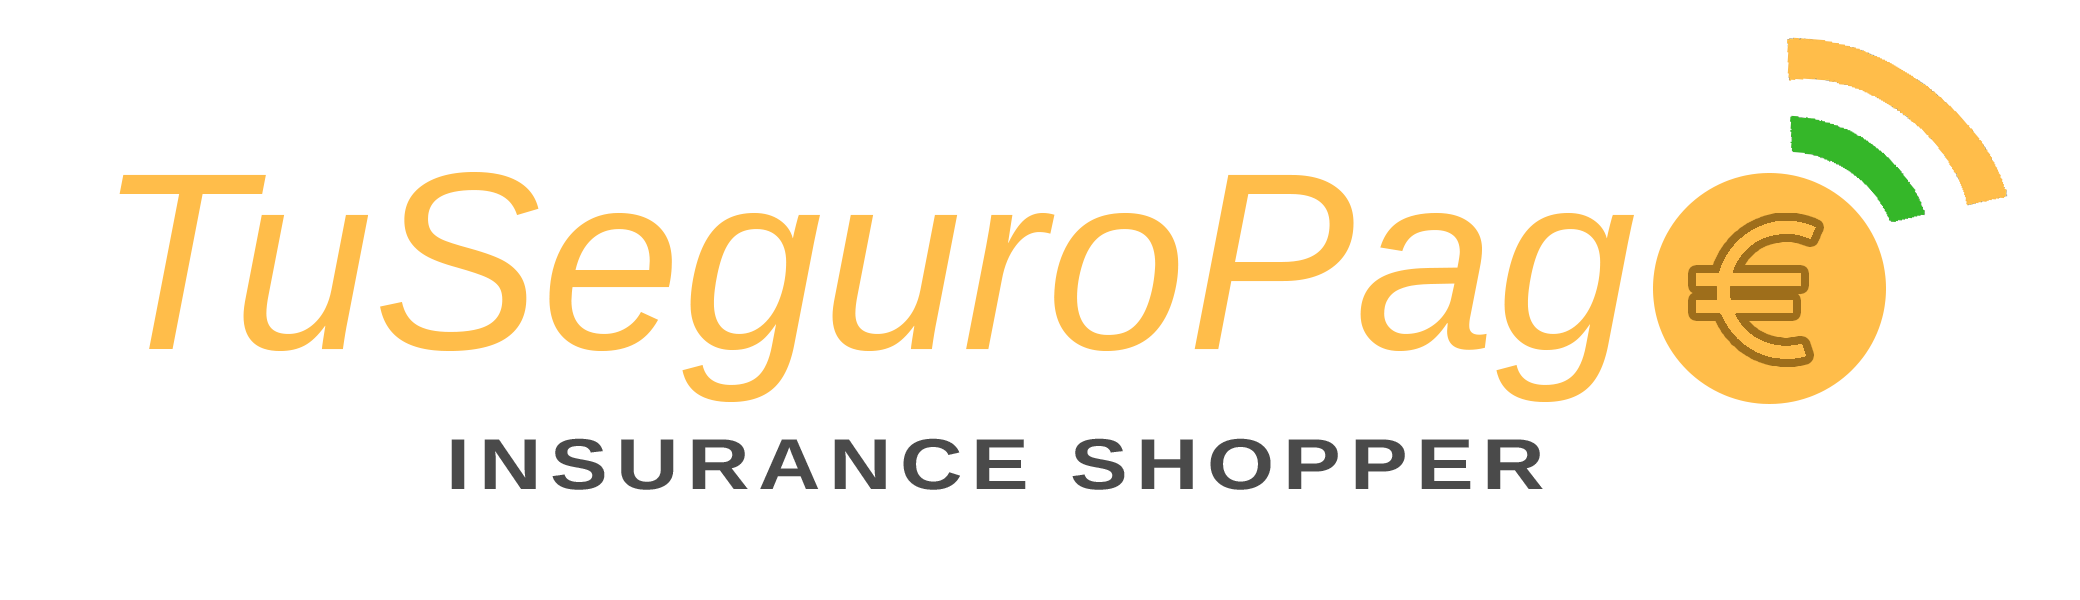 TuSeguroPago.com